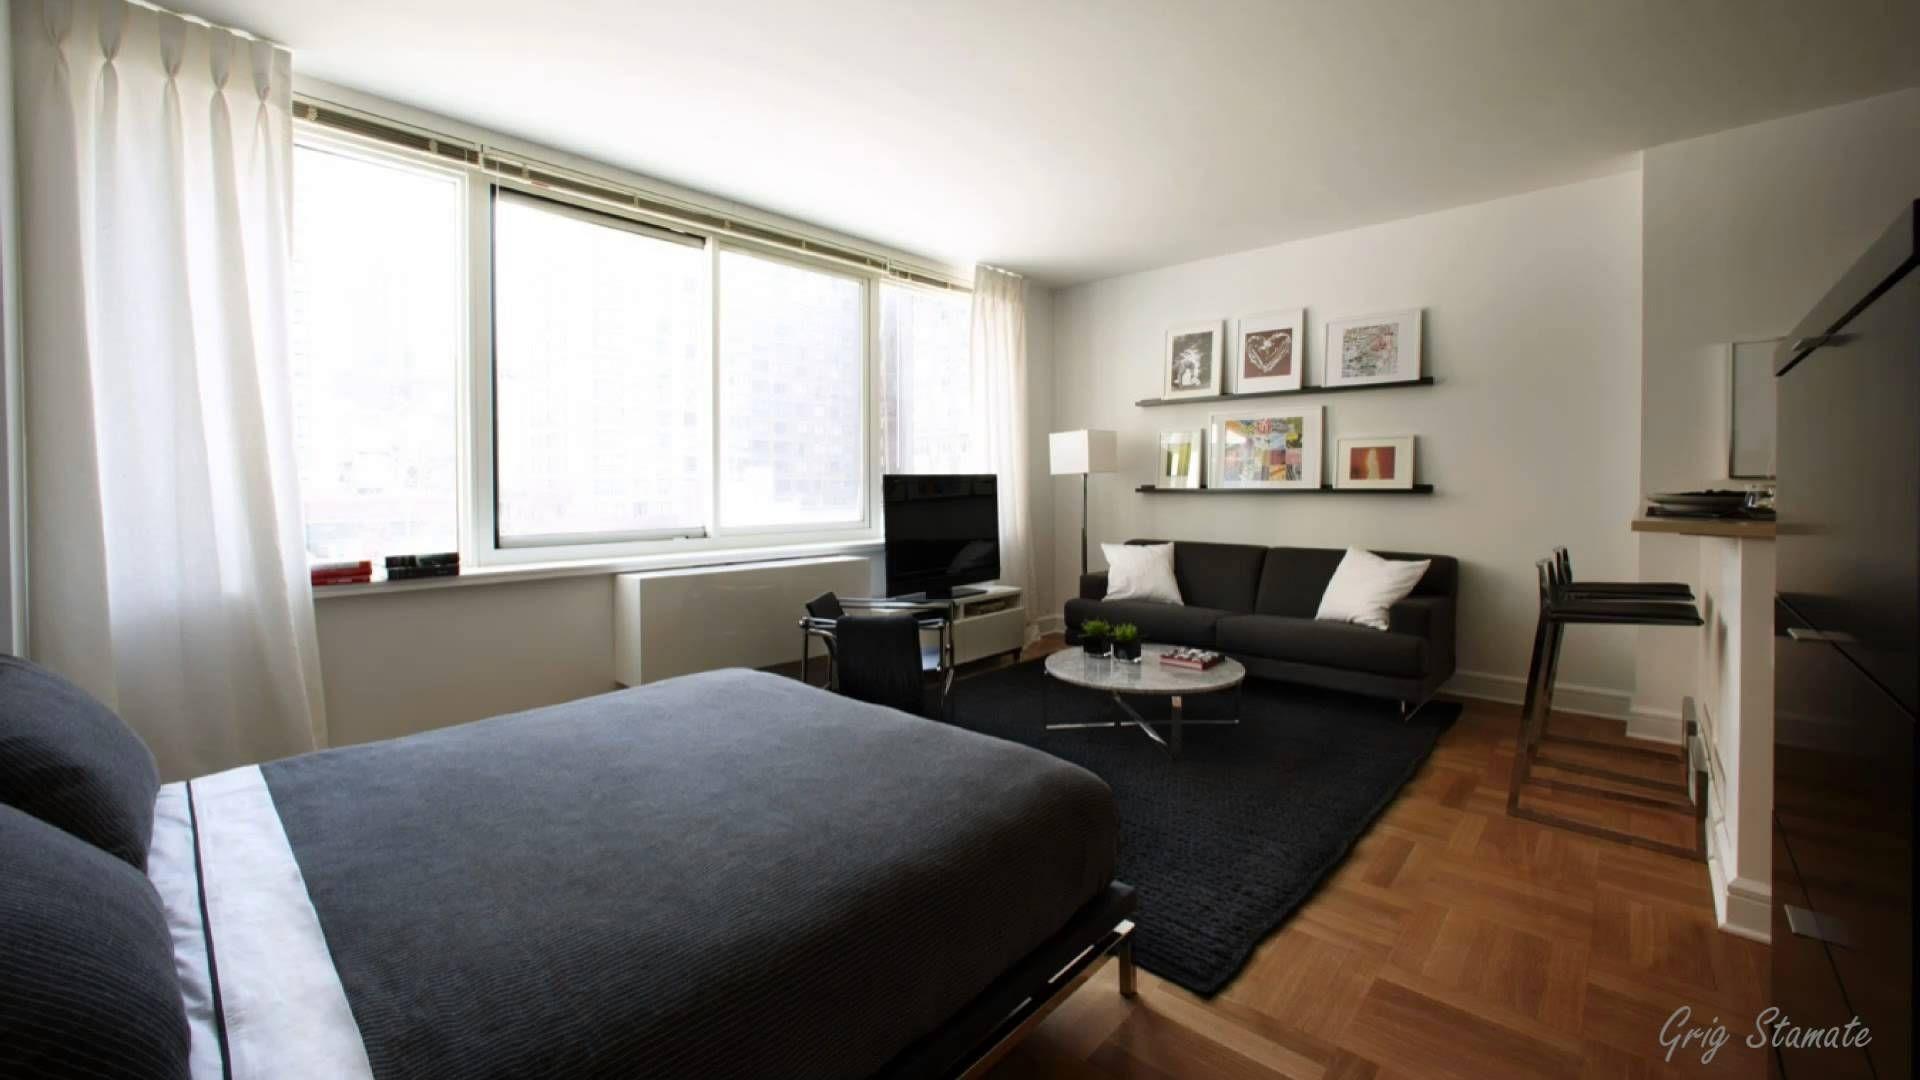 Apartment One Room Decorating Small Studio Basement Living ...